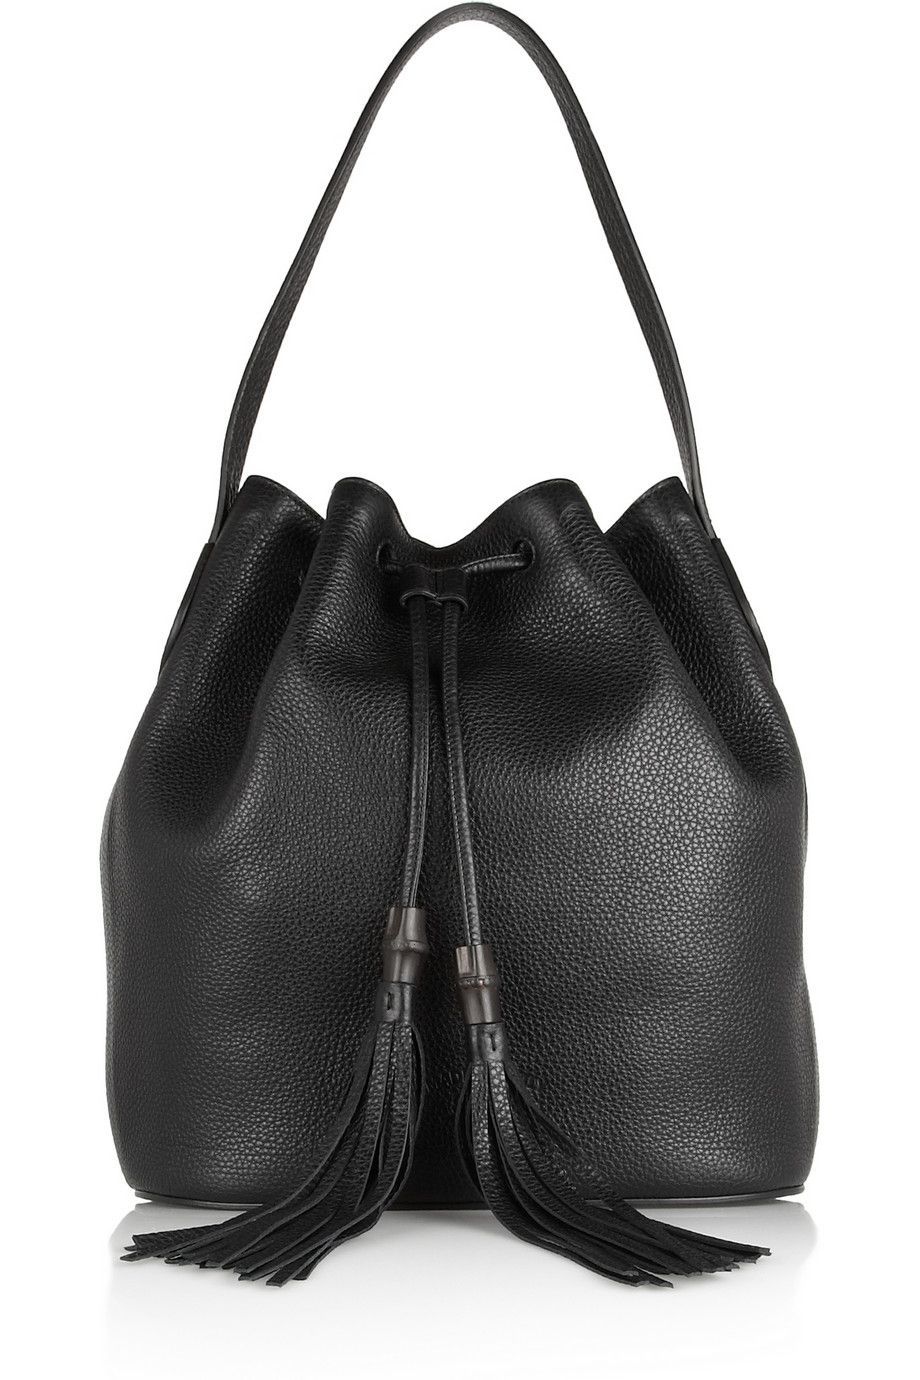 Gucci Lady Tassel textured-leather bucket bag NET-A-PORTER.COM